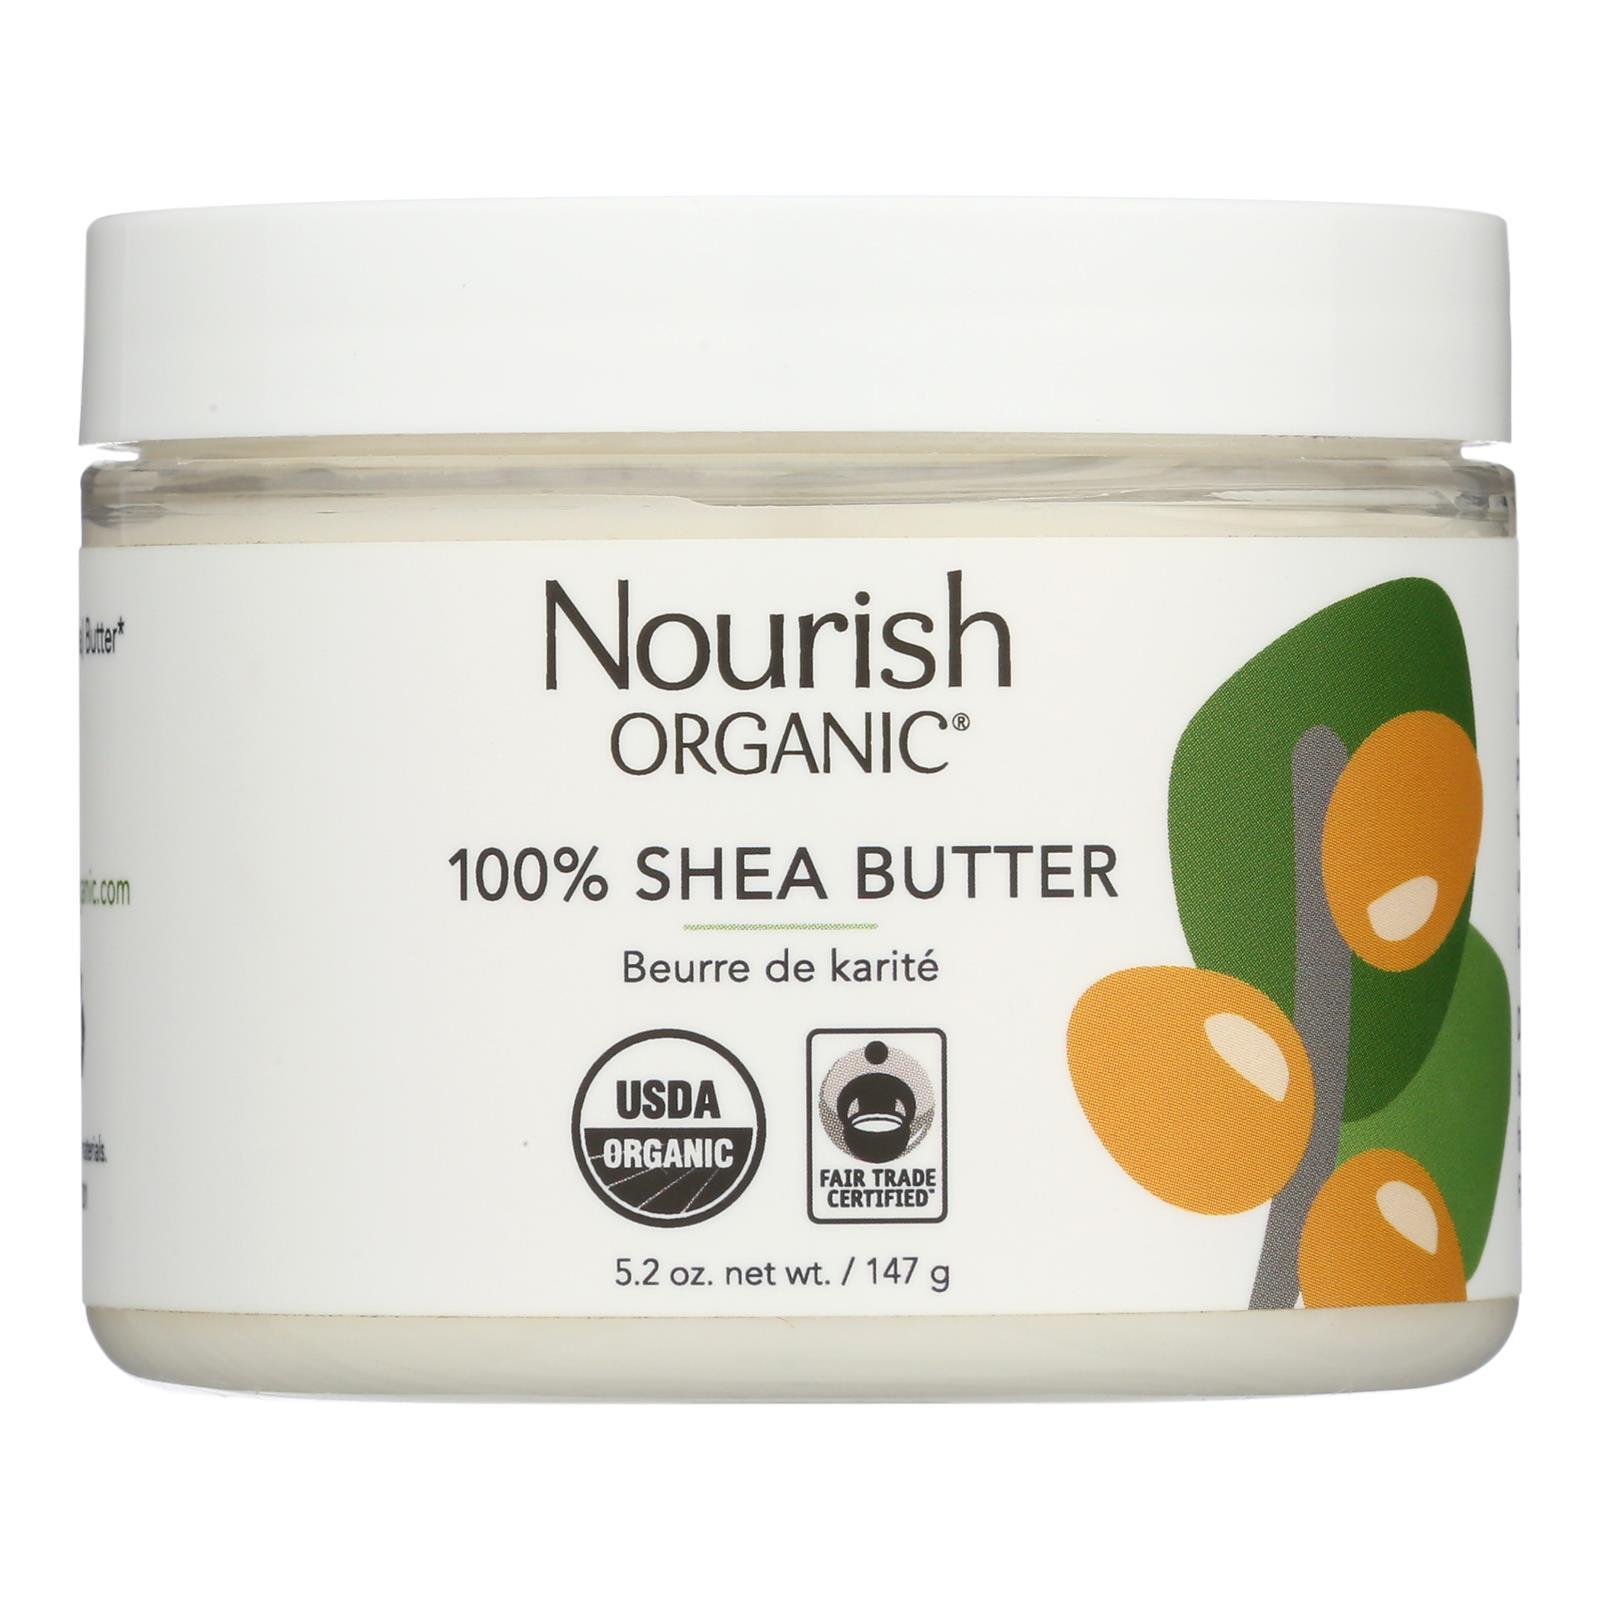 Nourish Moist Shea Bt